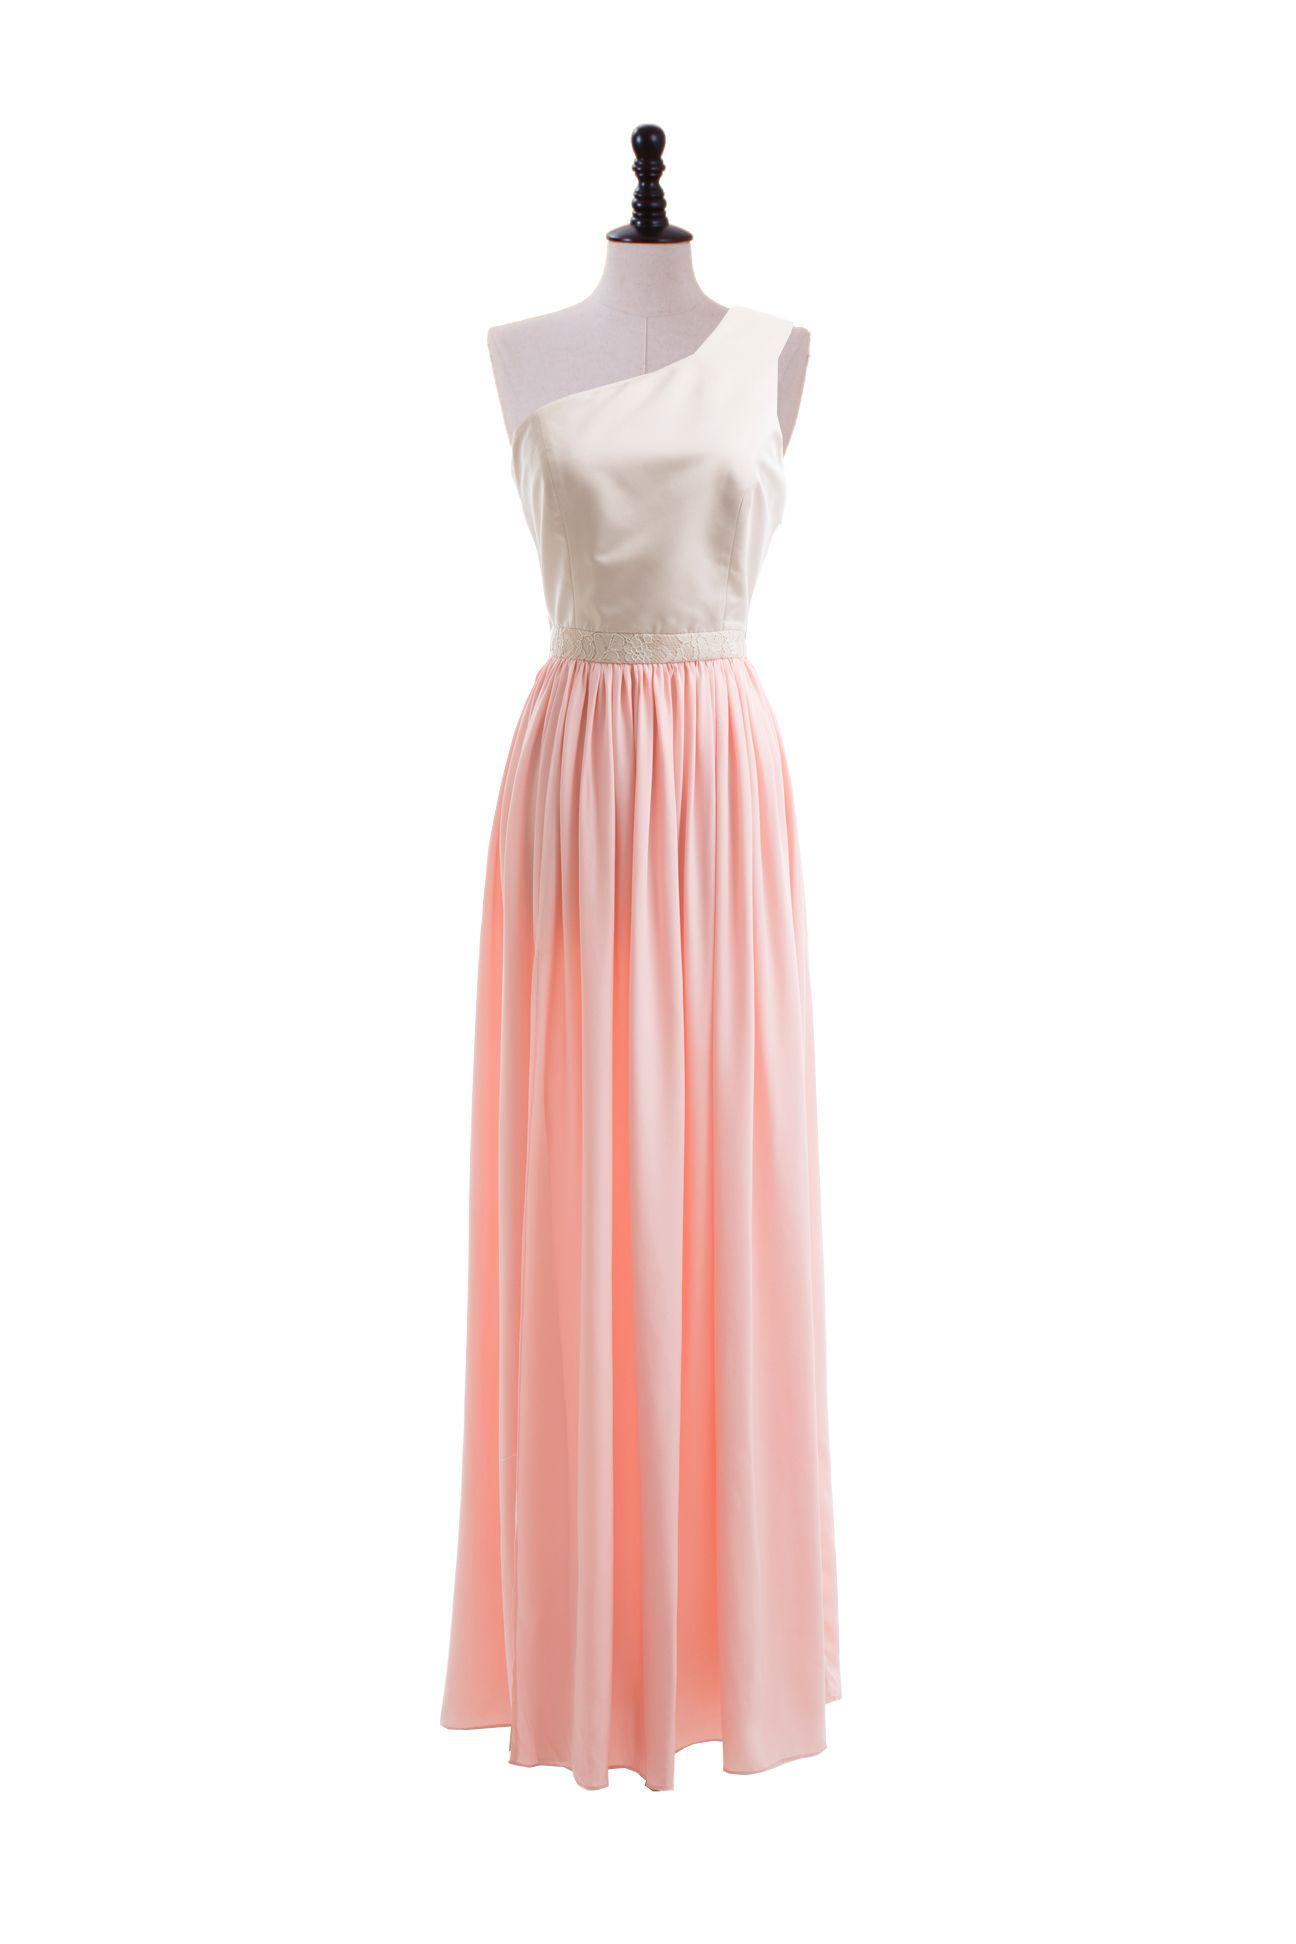 One shoulder floor length bridemaids dress  Read More:     http://www.weddingsred.com/index.php?r=fancy-strapless-lace-meet-satin-short-length-dress.html